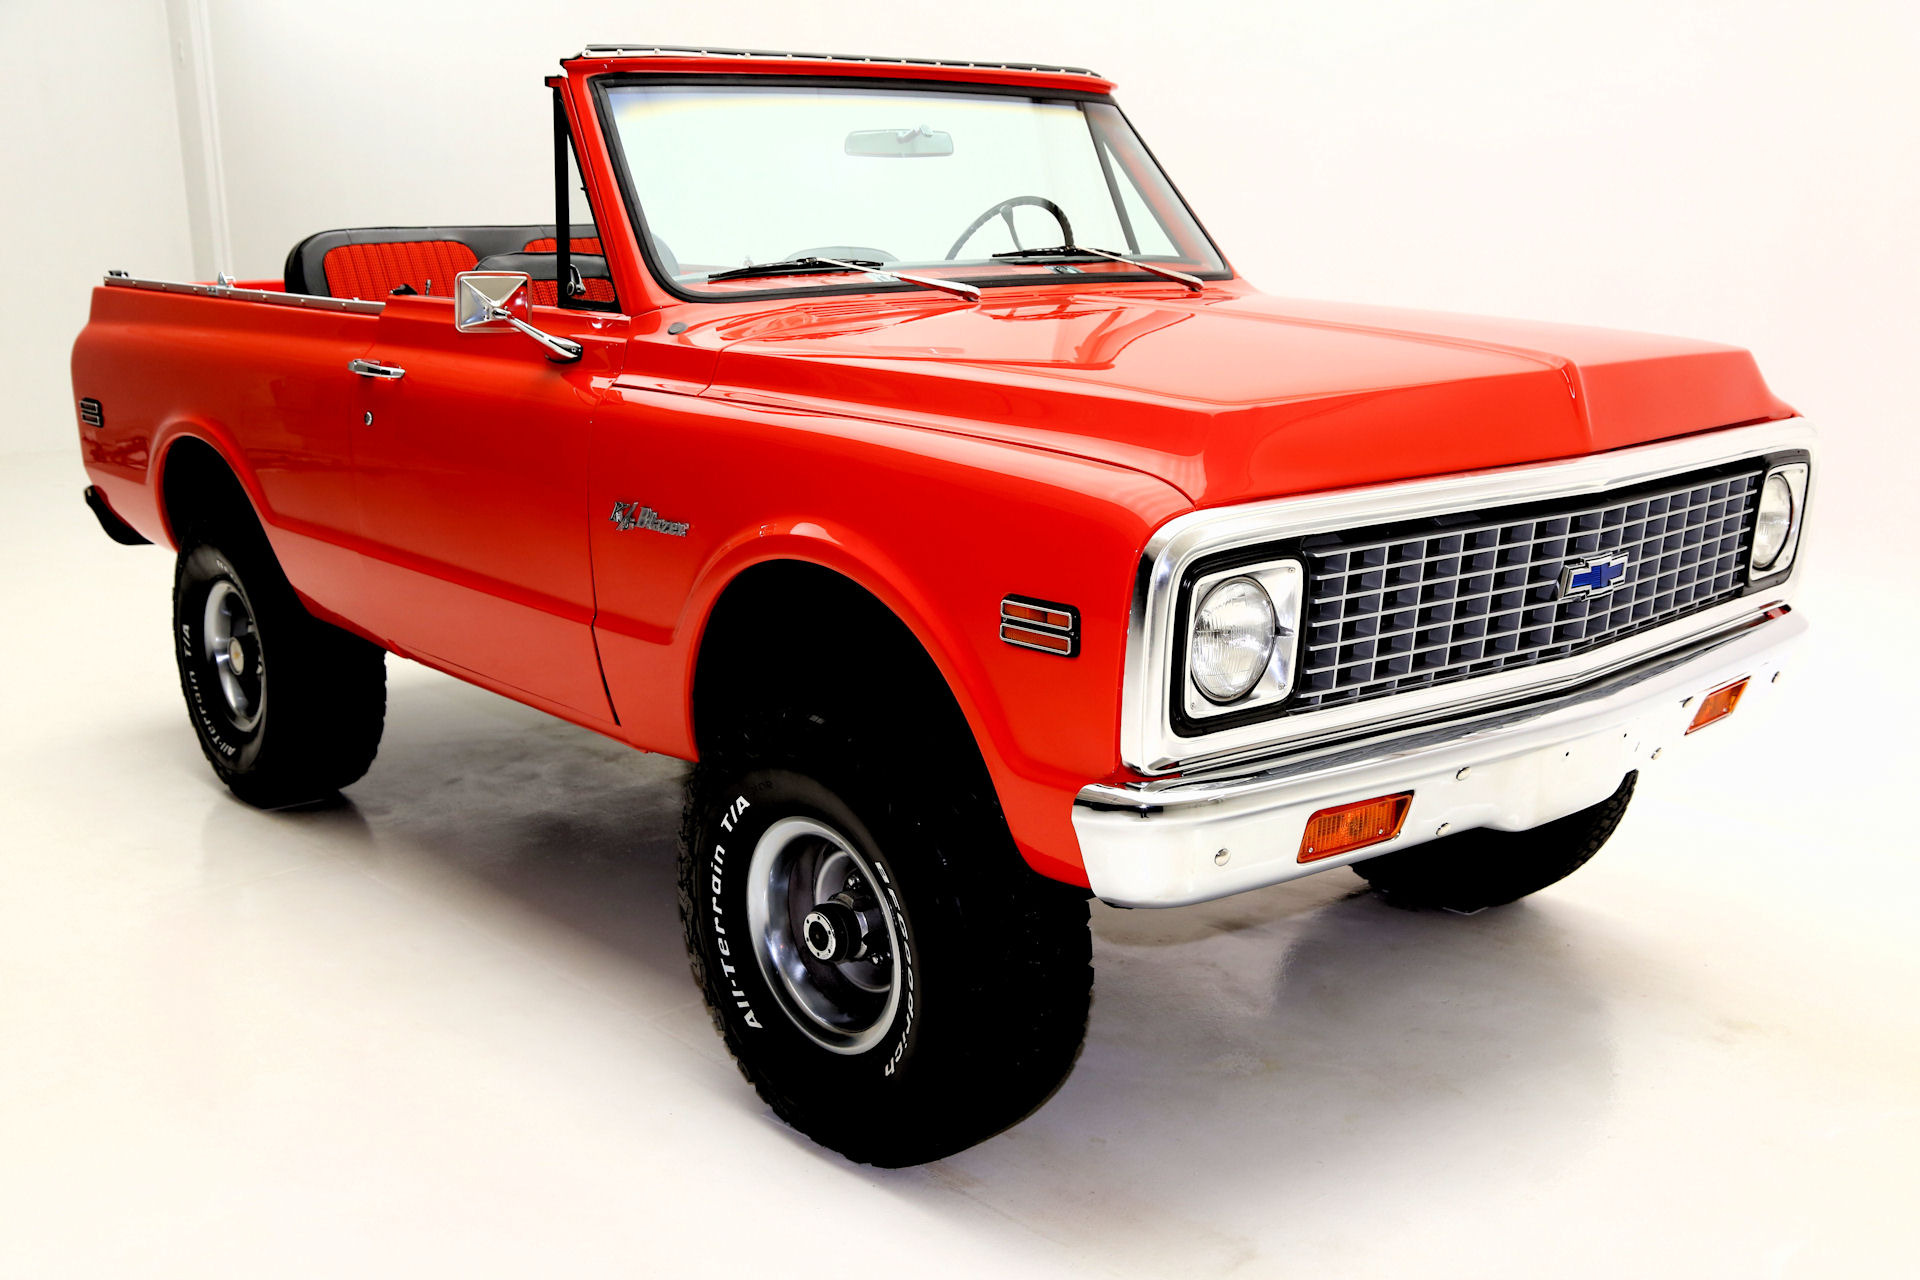 1972 Chevrolet Blazer K5 Orange Houndstooth Int